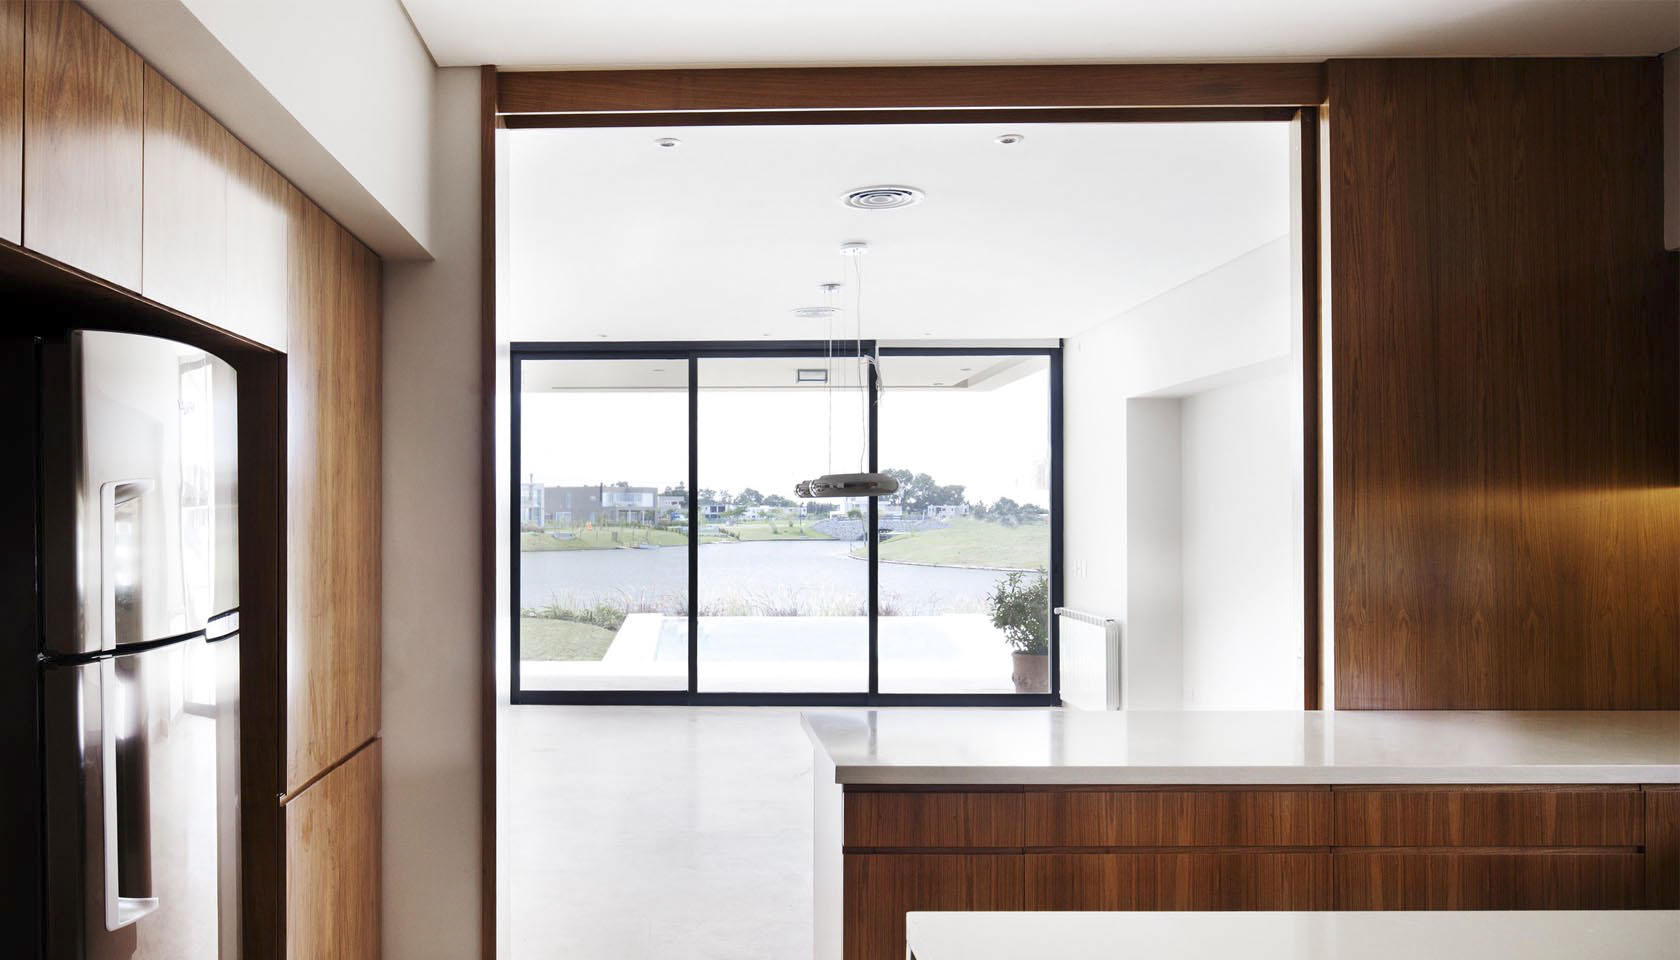 interiores cálidos, diseño de cocinas, cajoneras de madera en cocinas contemporáneas